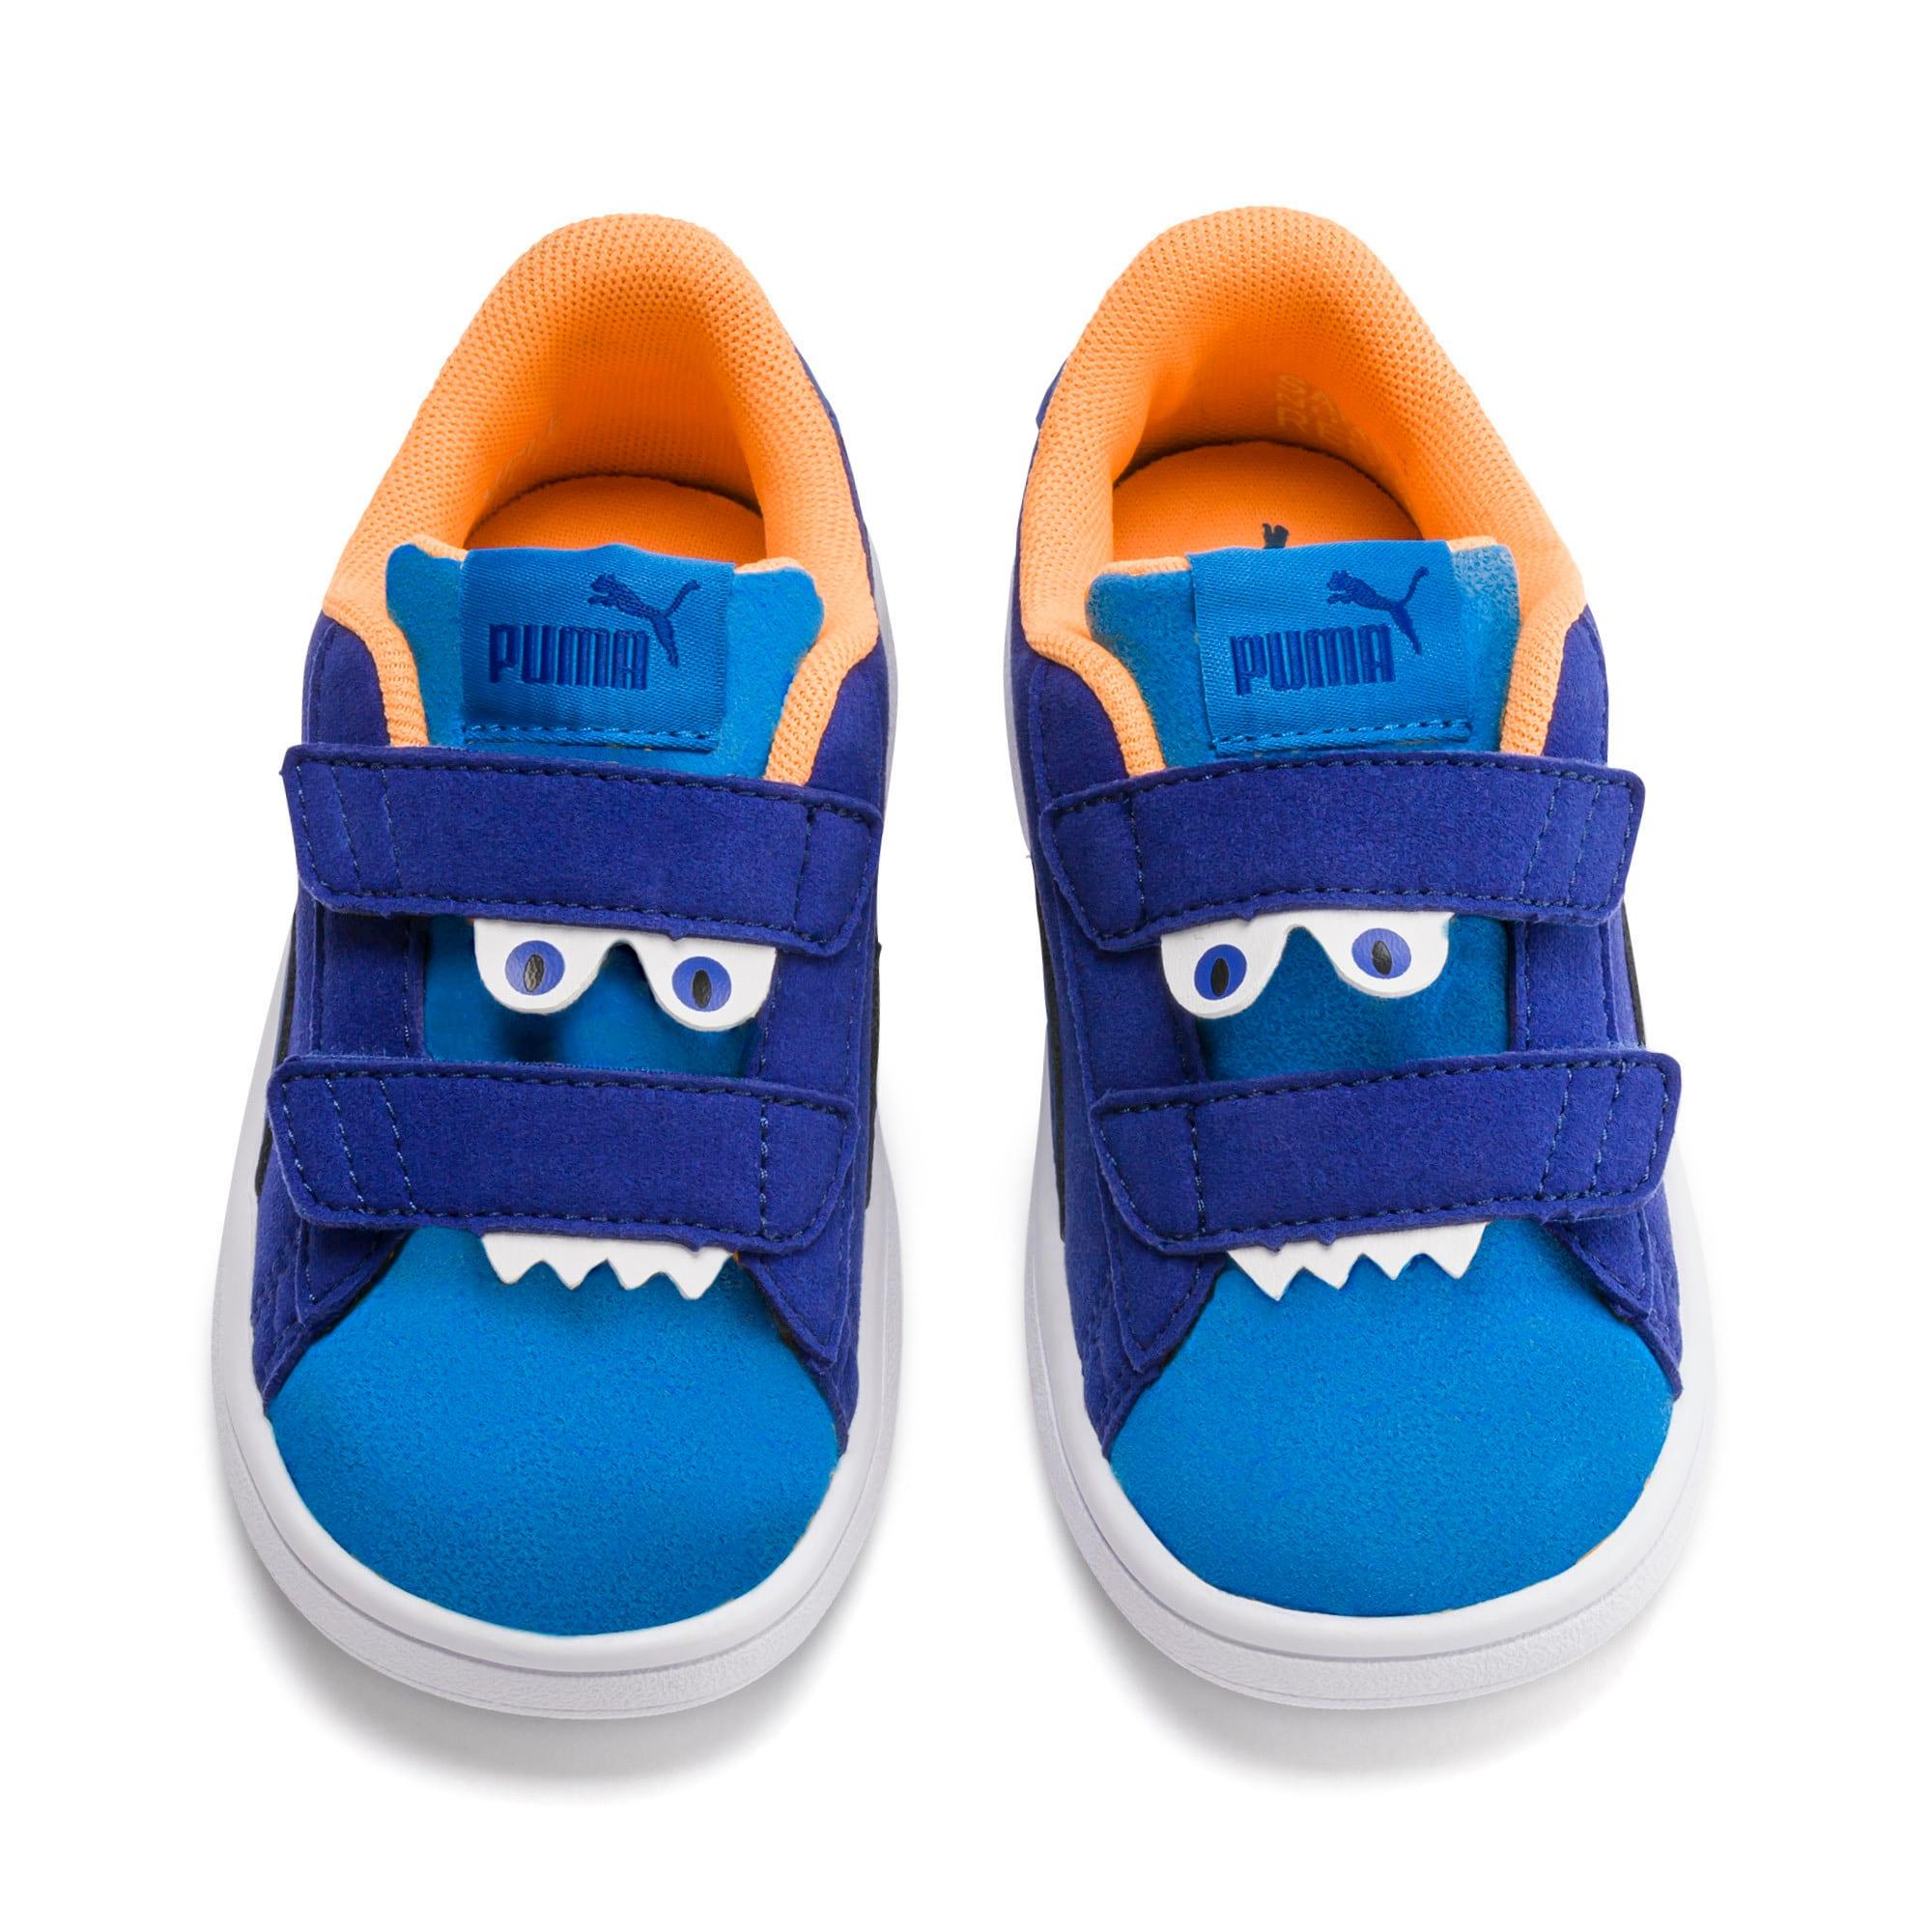 Thumbnail 7 of PUMA Smash v2 Monster Toddler Shoes, Sf Th Wb-I Bunting-Ornge-Wht, medium